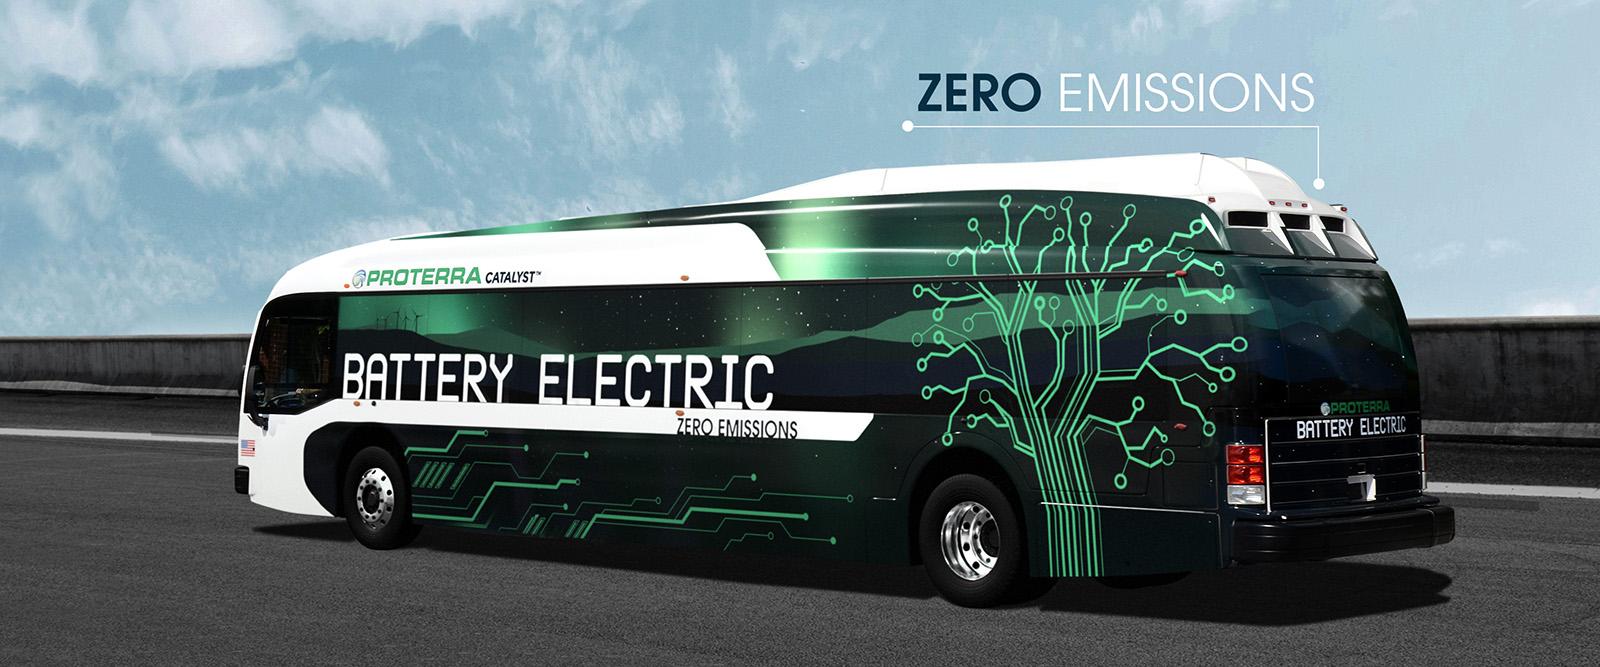 ZeroEmission Vehicles Version 20  The Sustainable Investor